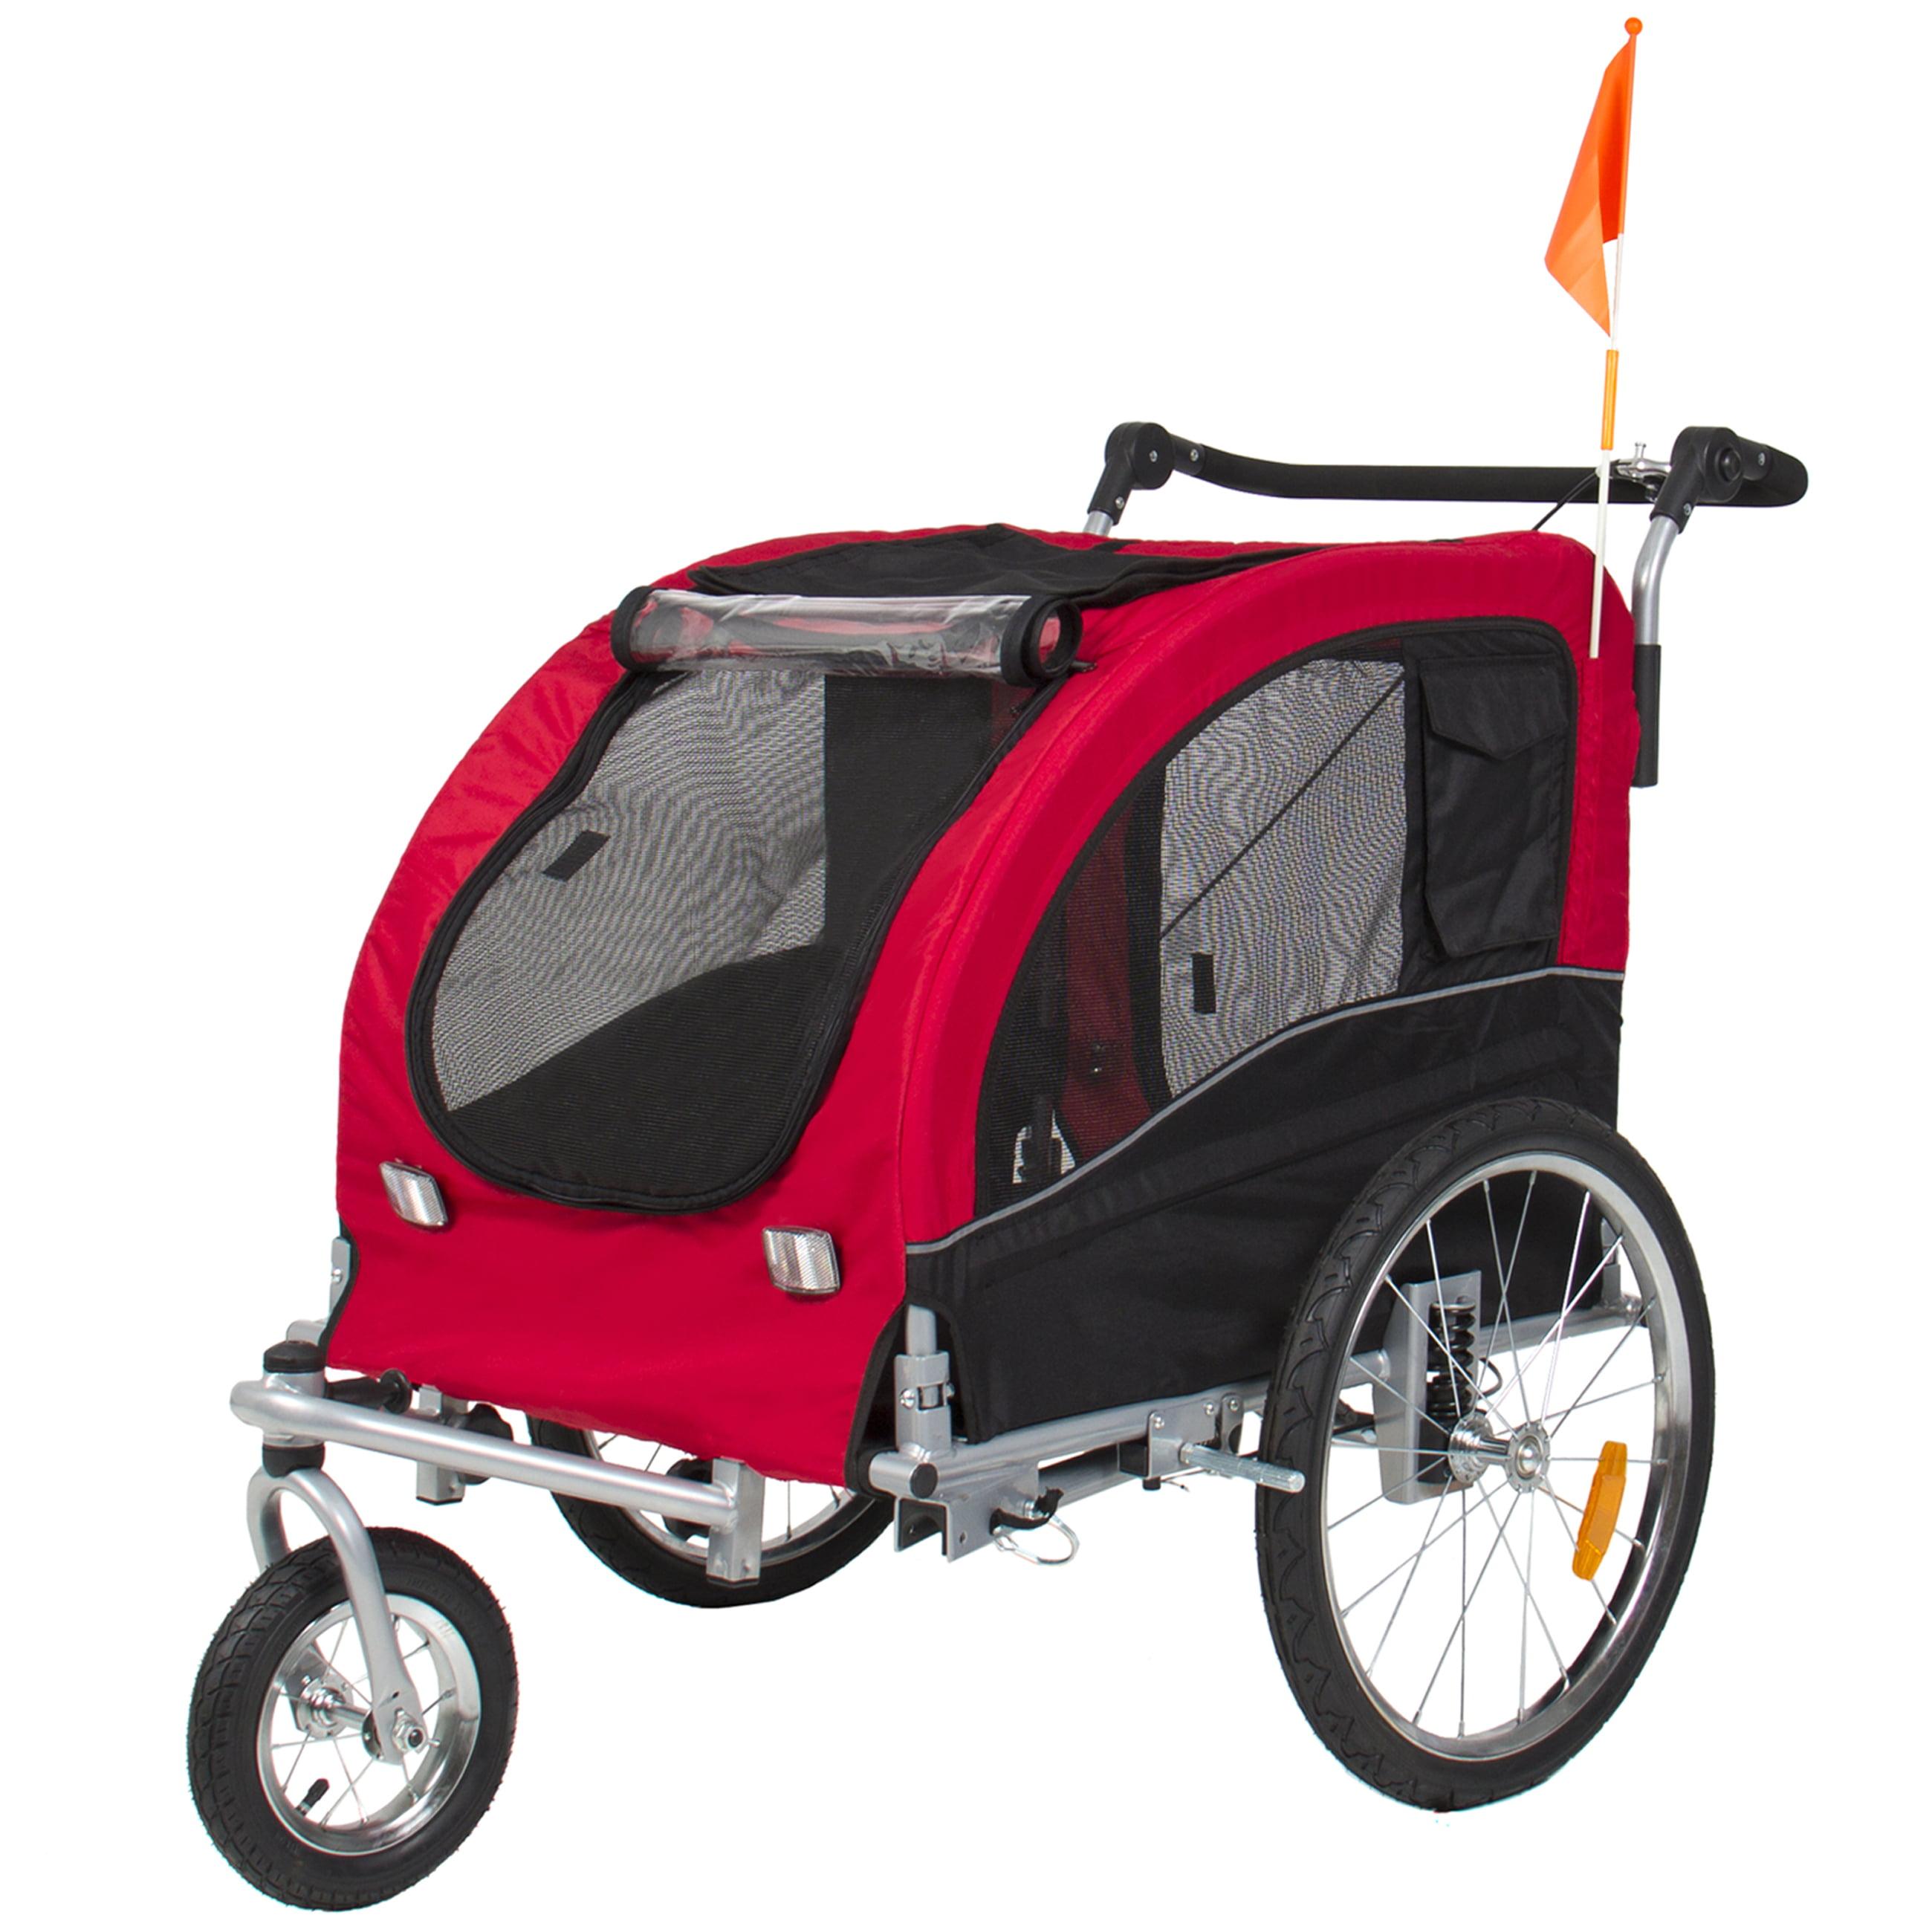 2 IN 1 Pet Dog Bike Trailer Bicycle Trailer Stroller Jogging w/ Suspension Red